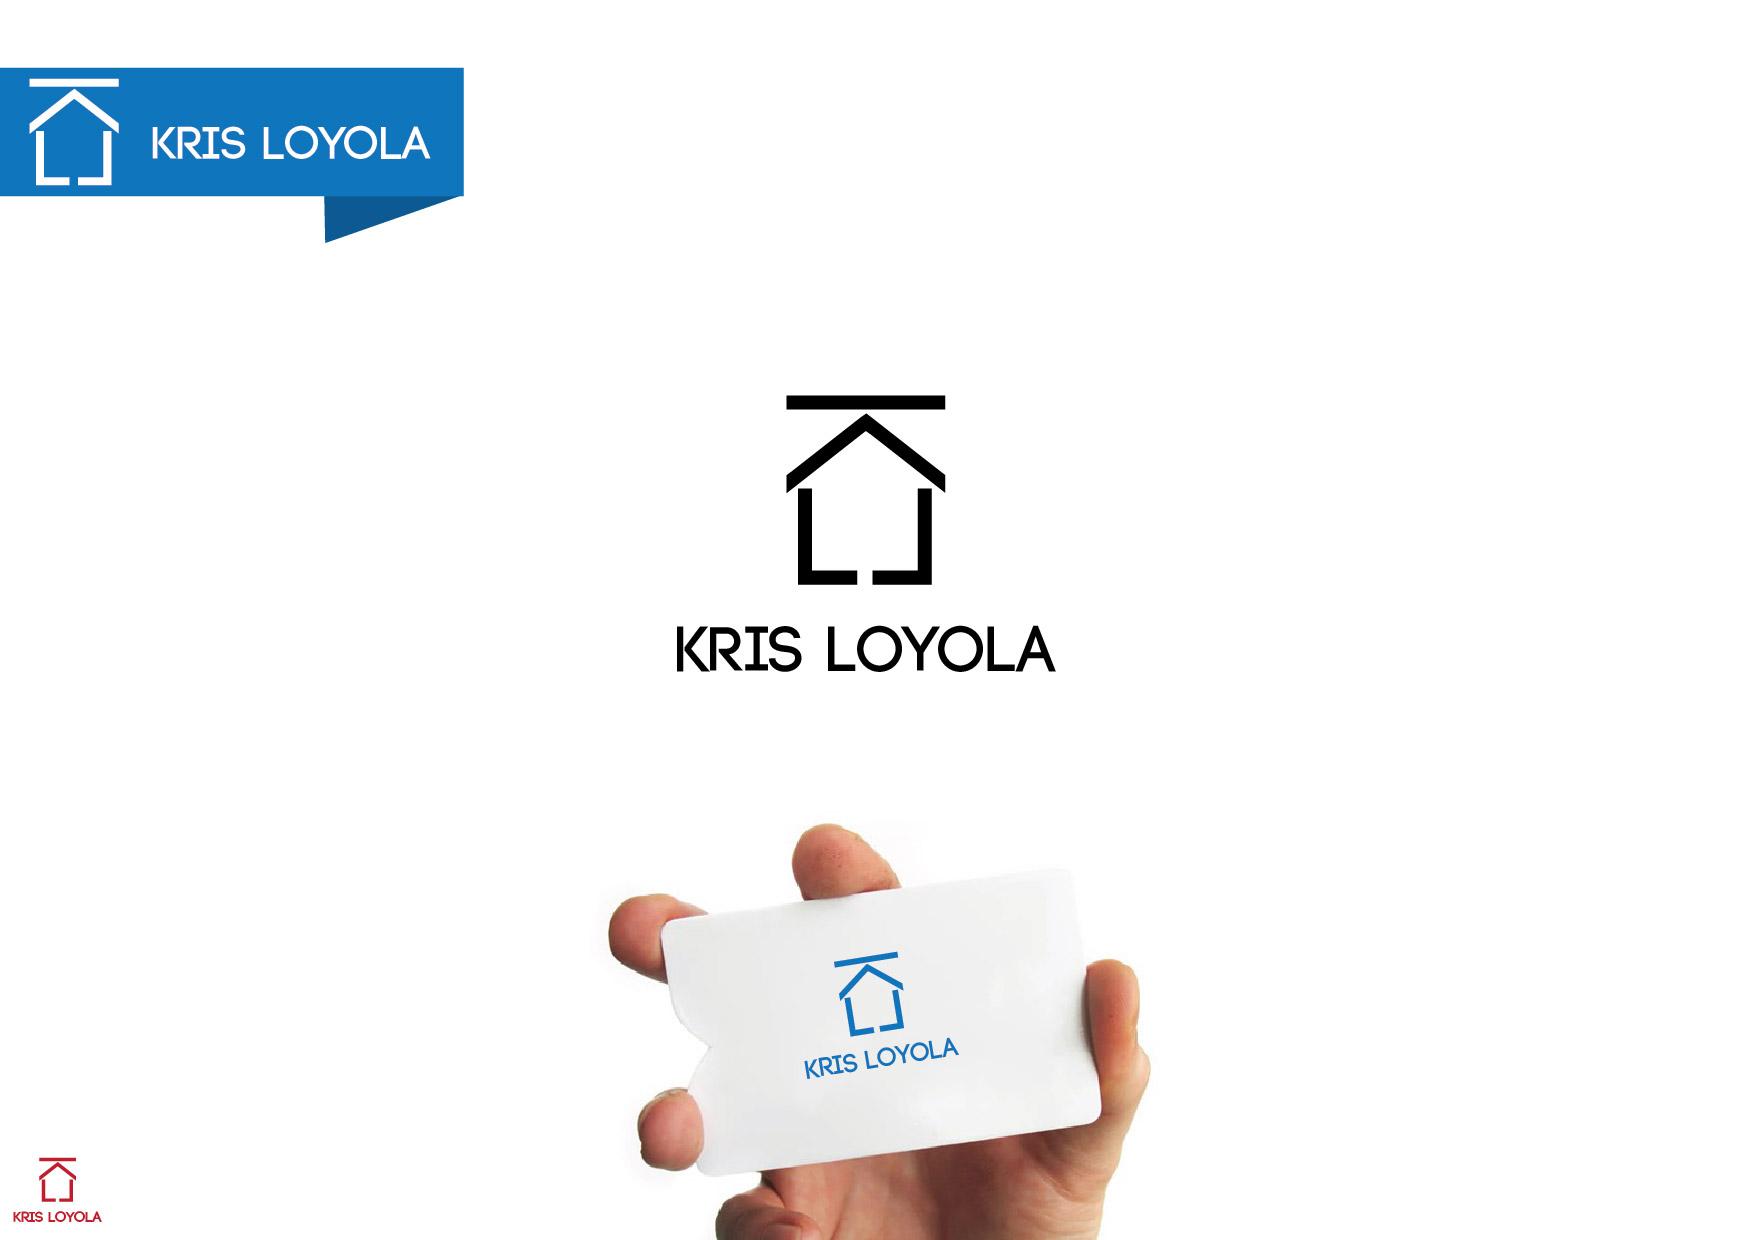 Logo Design by Bojan Oreskovic - Entry No. 161 in the Logo Design Contest Kris Loyola Logo Design.